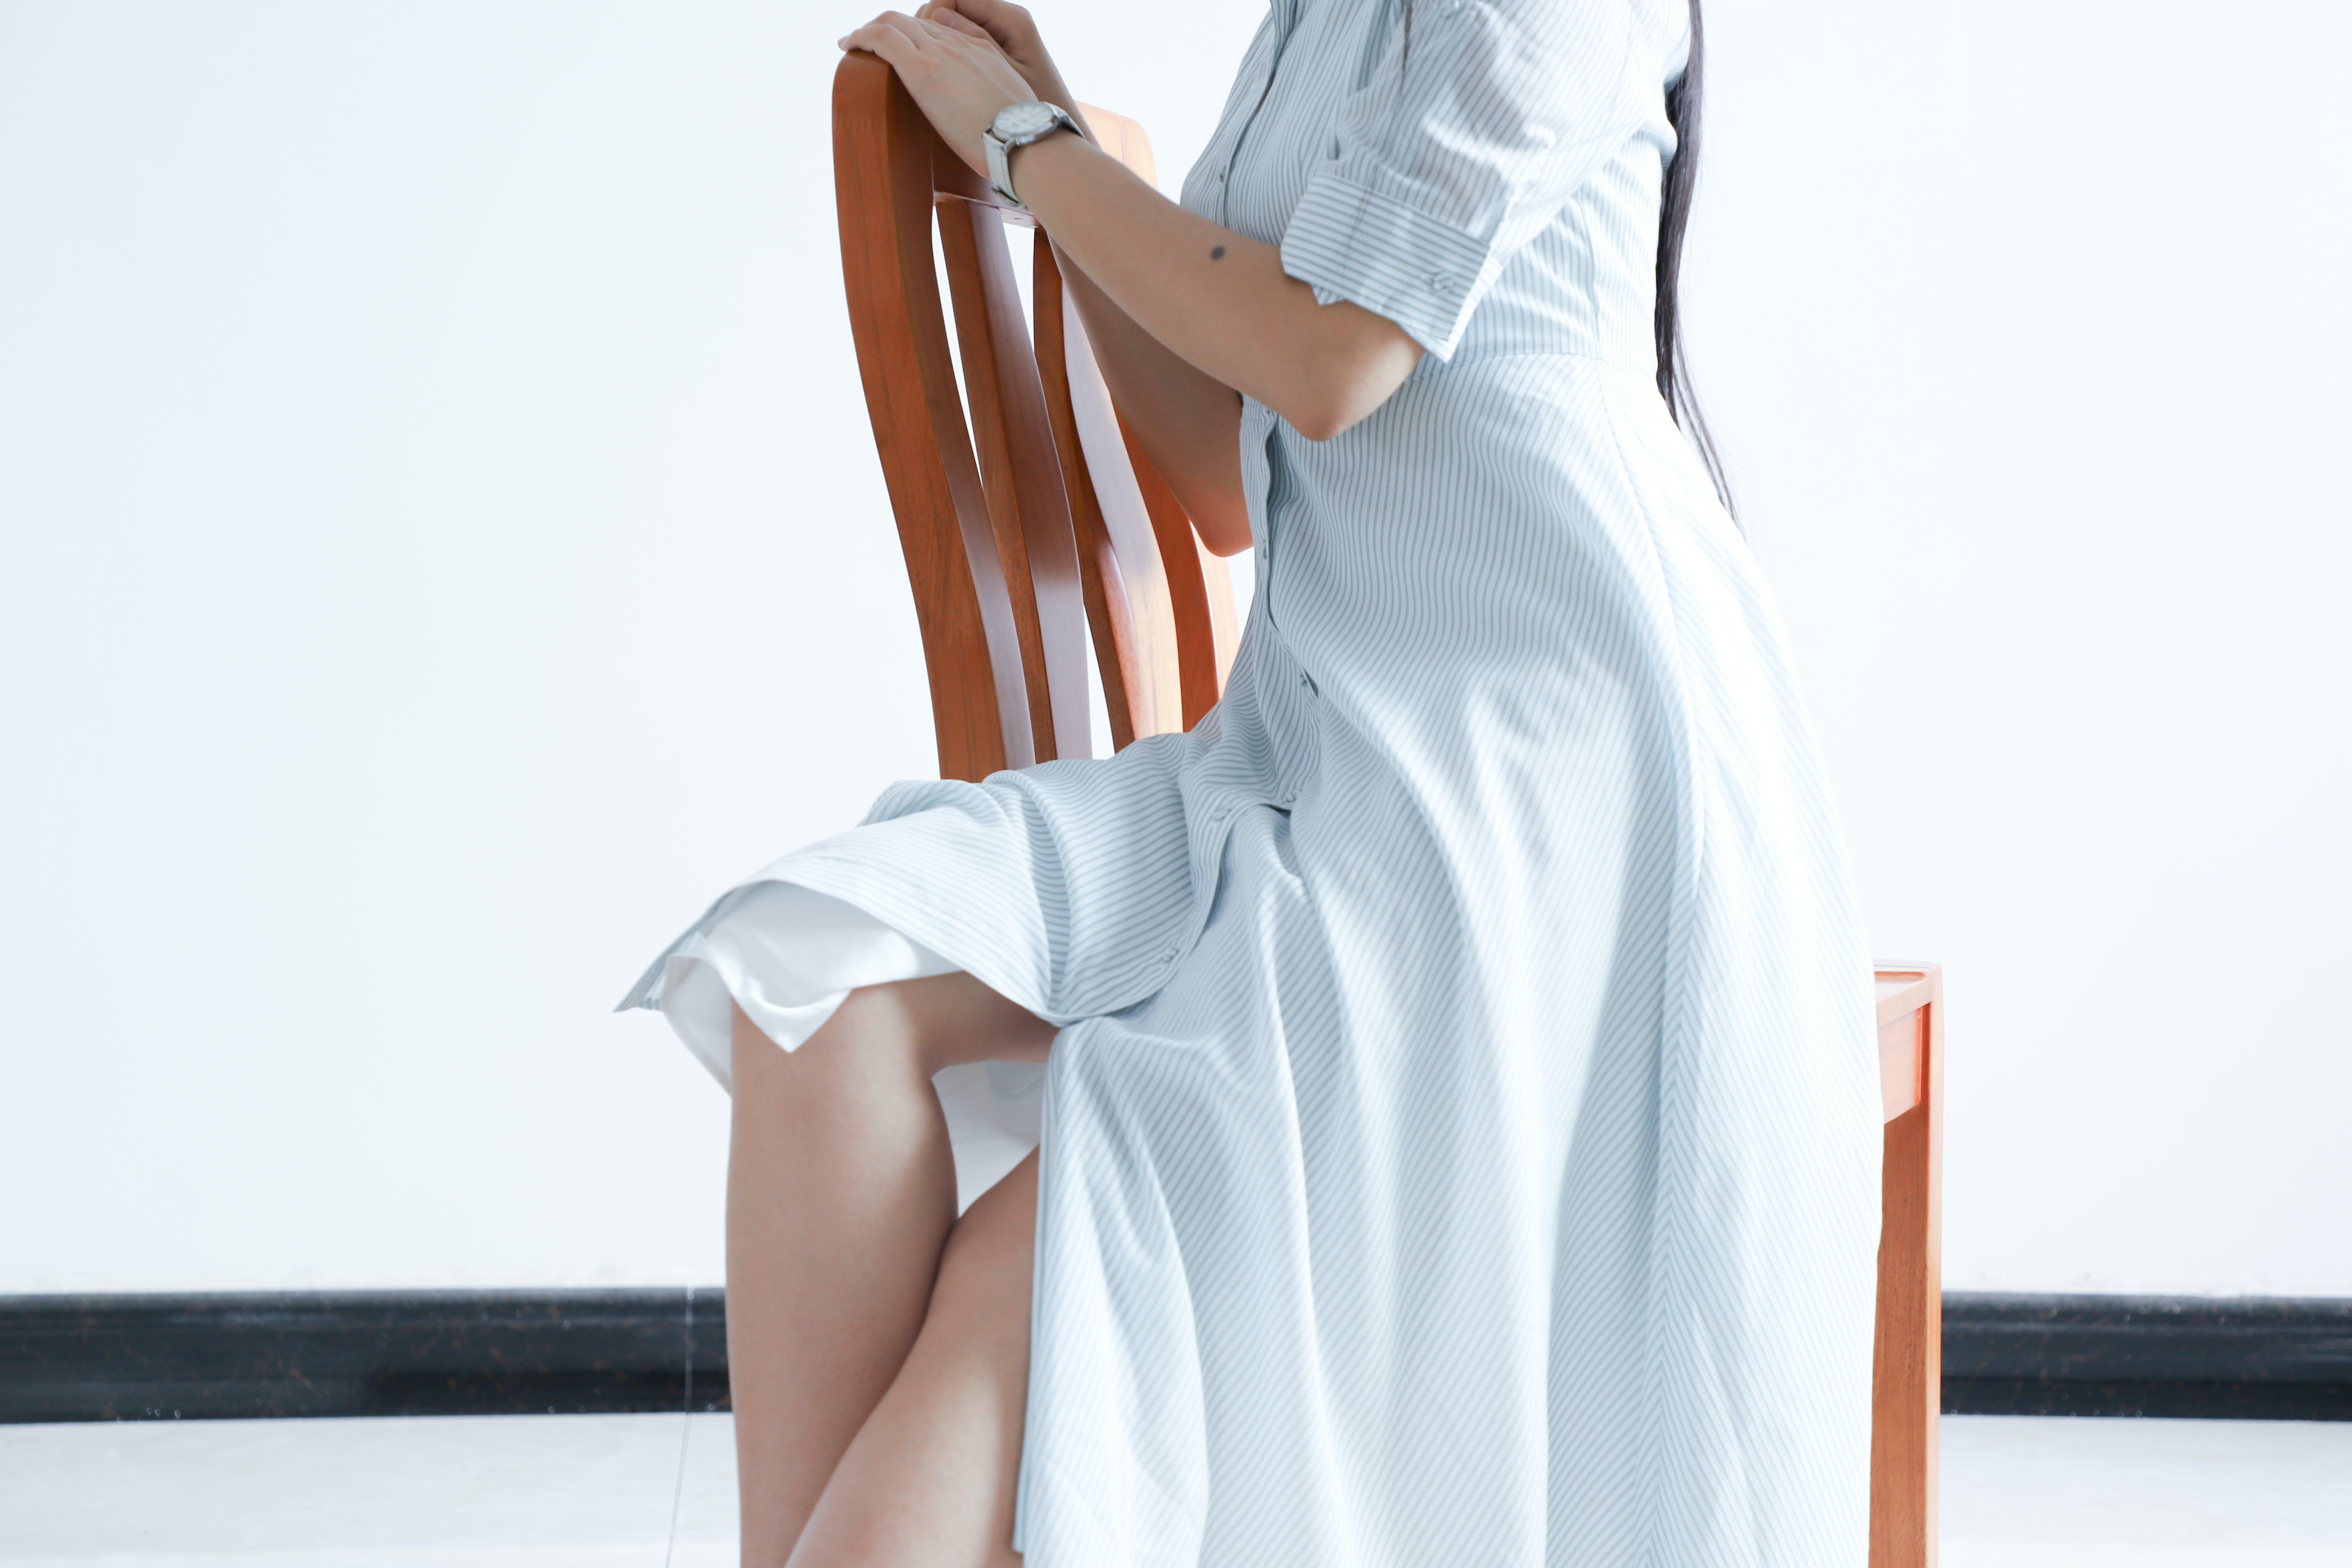 Woman Wearing Dress Sitting On Chair